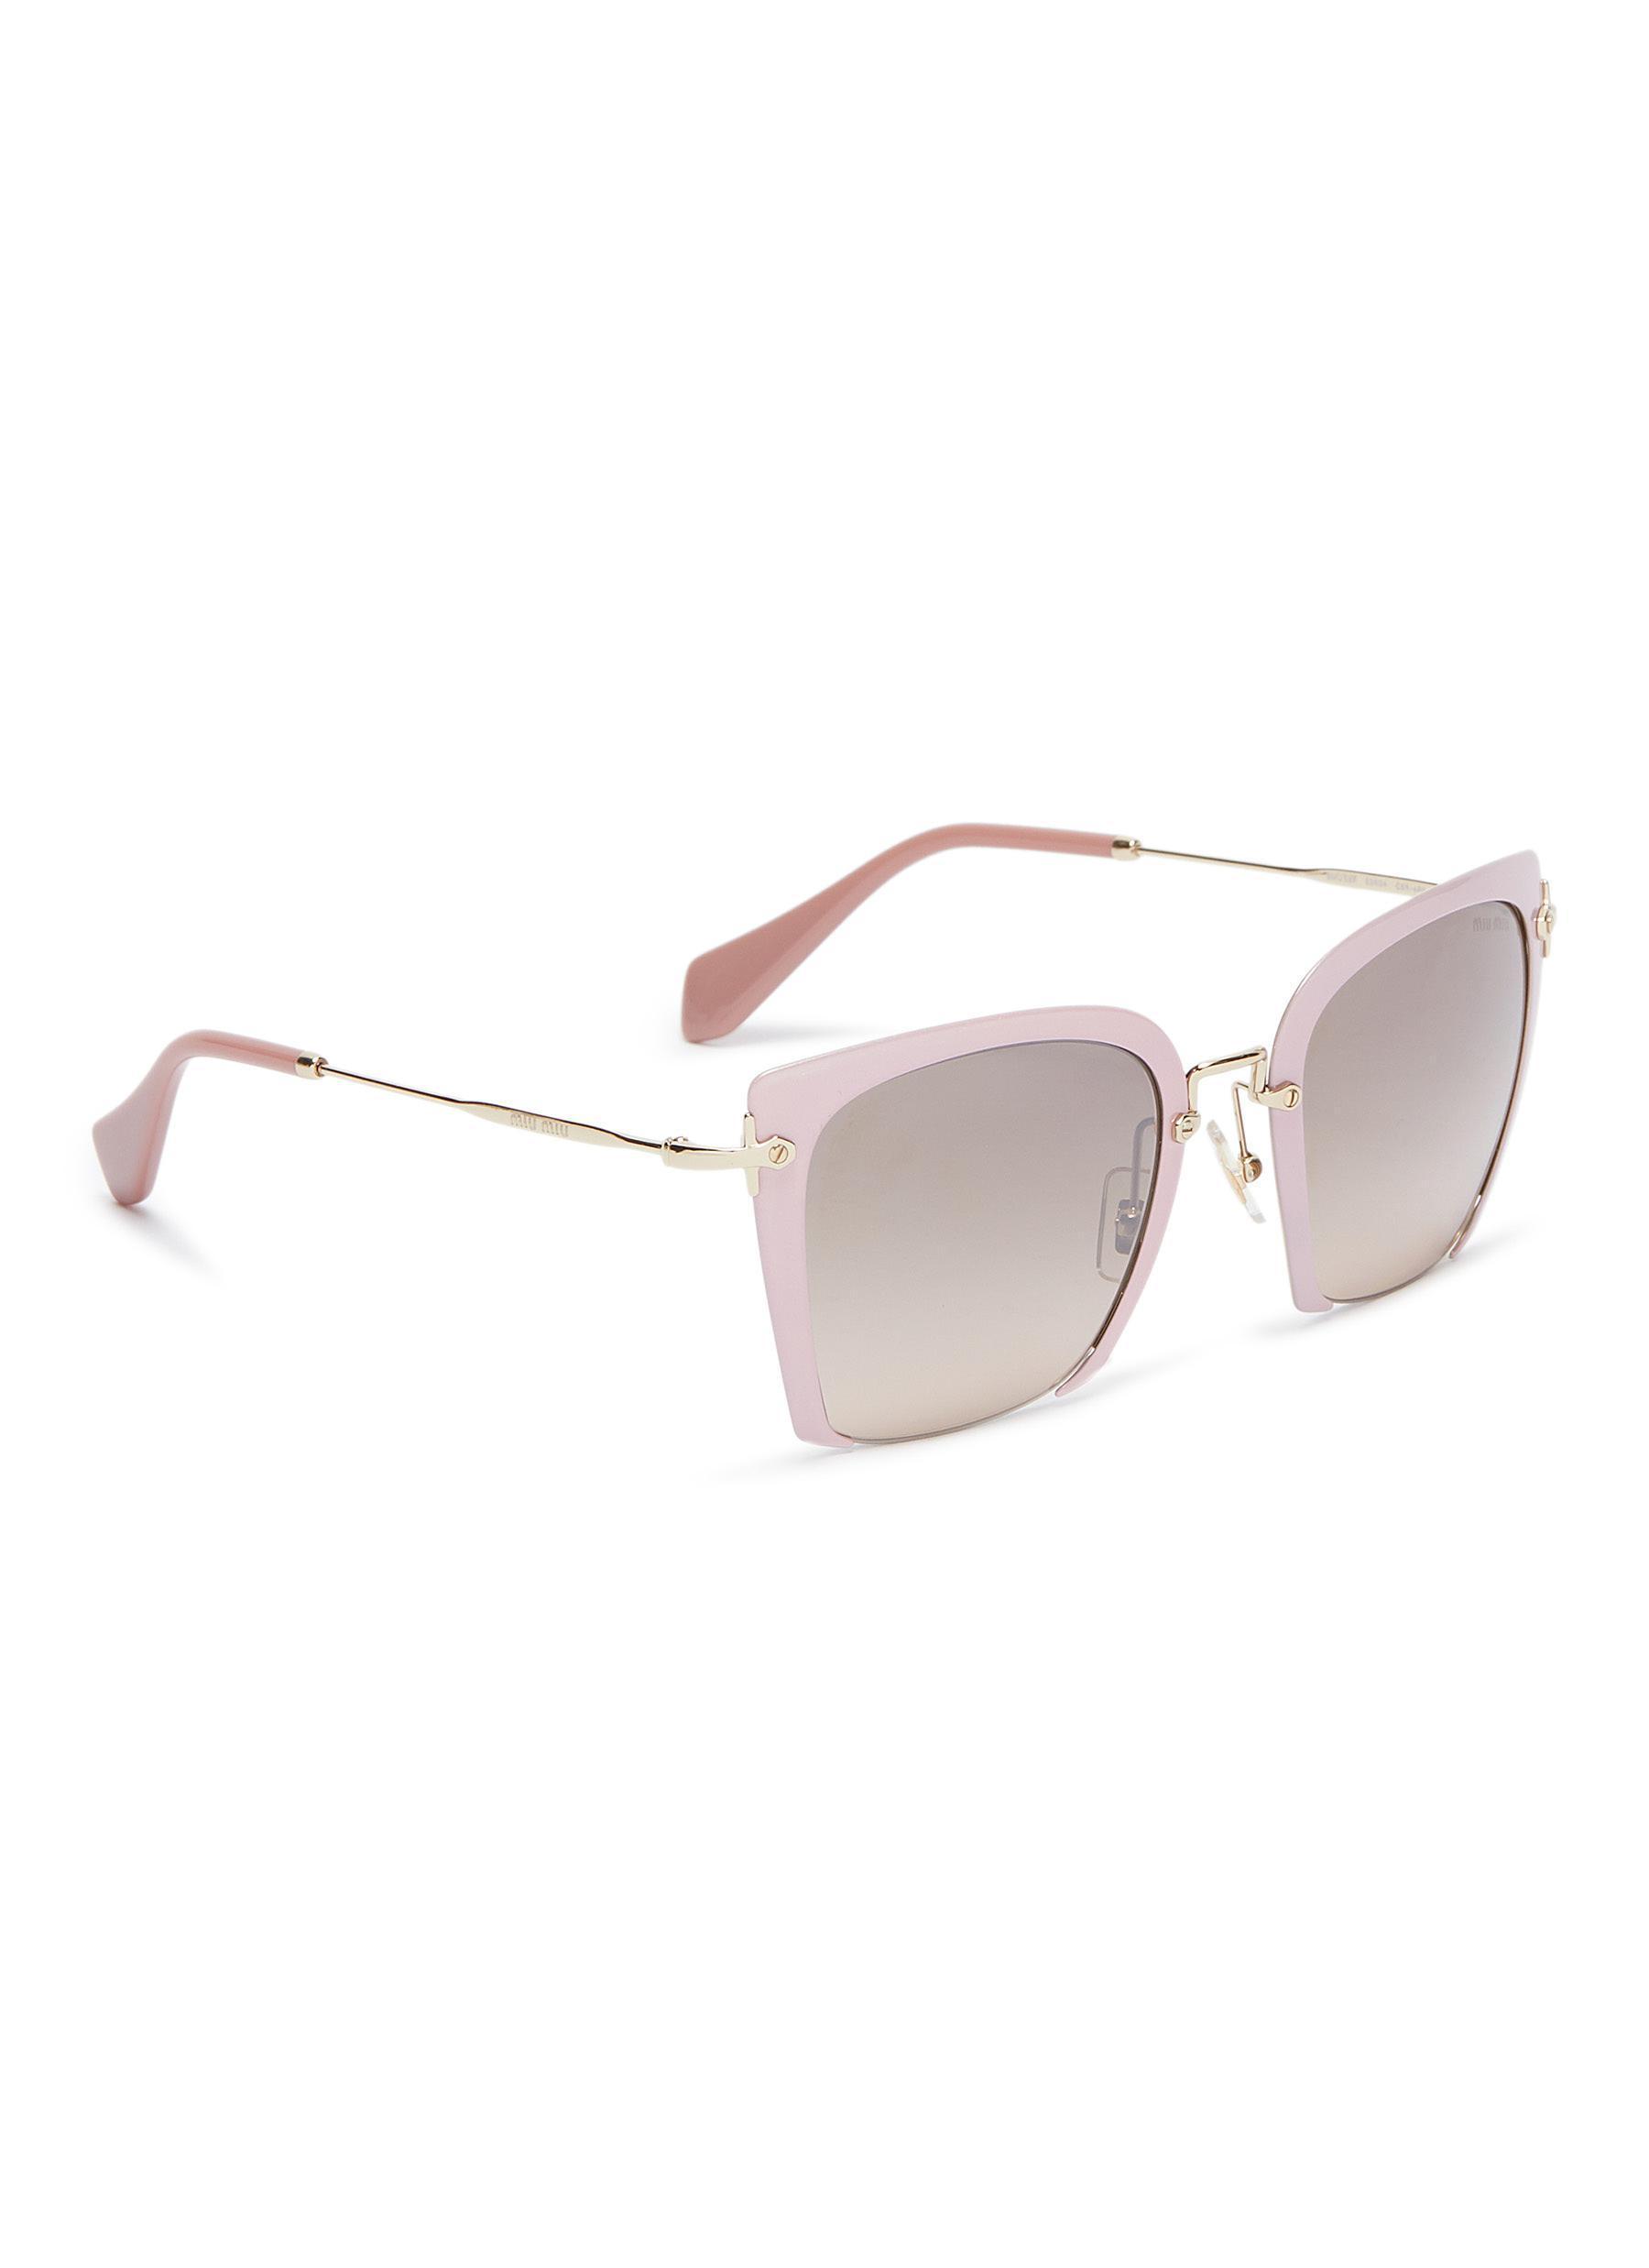 9842d087ed2 Miu Miu - Pink Cutout Acetate Front Metal Square Sunglasses - Lyst. View  fullscreen